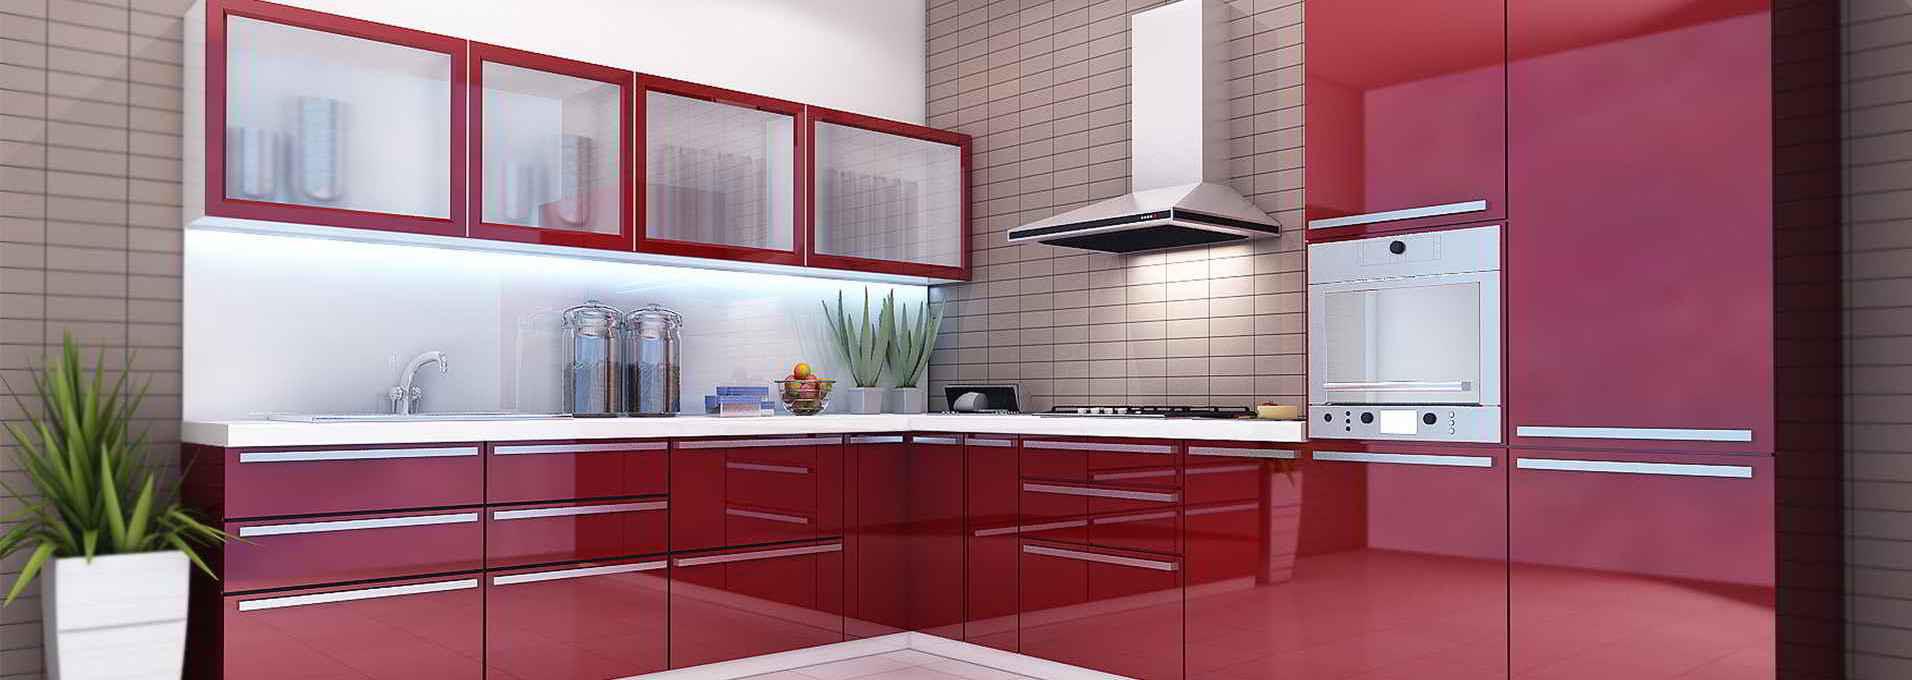 fitted kitchens coatbridge